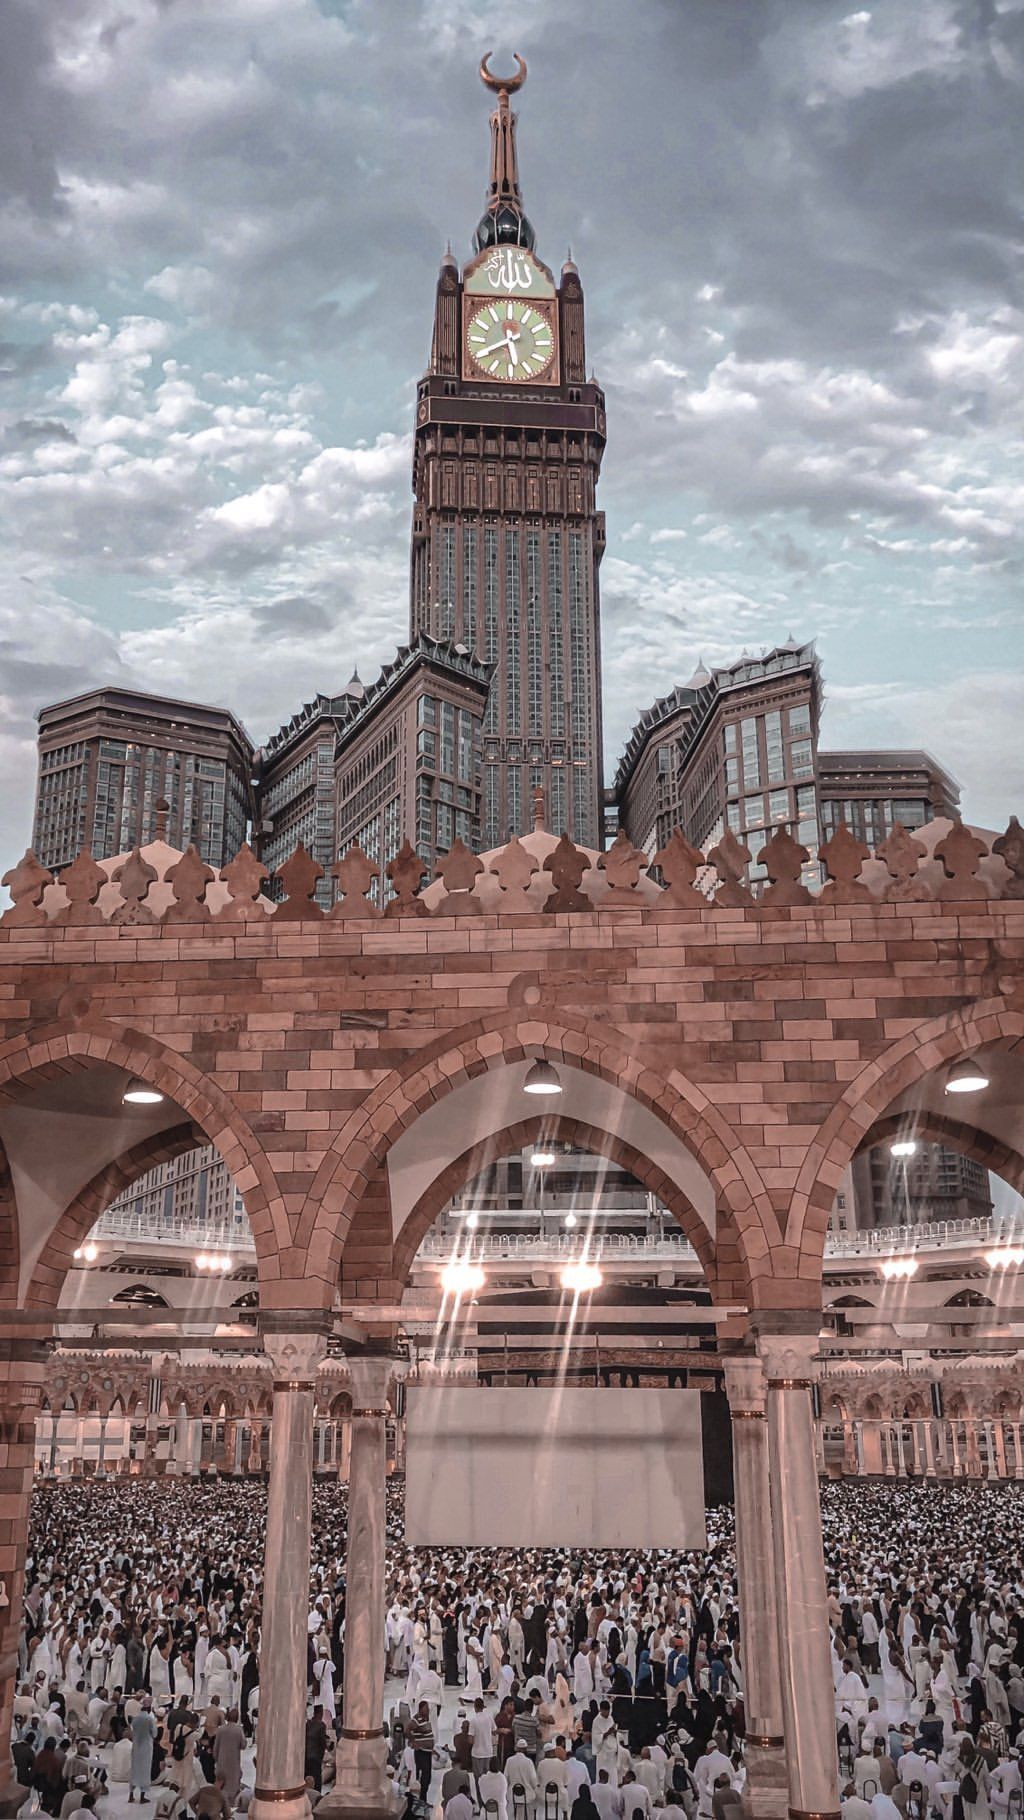 Pin Oleh Alhrbysmr Di Rahmatulloh Arsitektur Budaya Arsitektur Masjid Gambar Menakjubkan